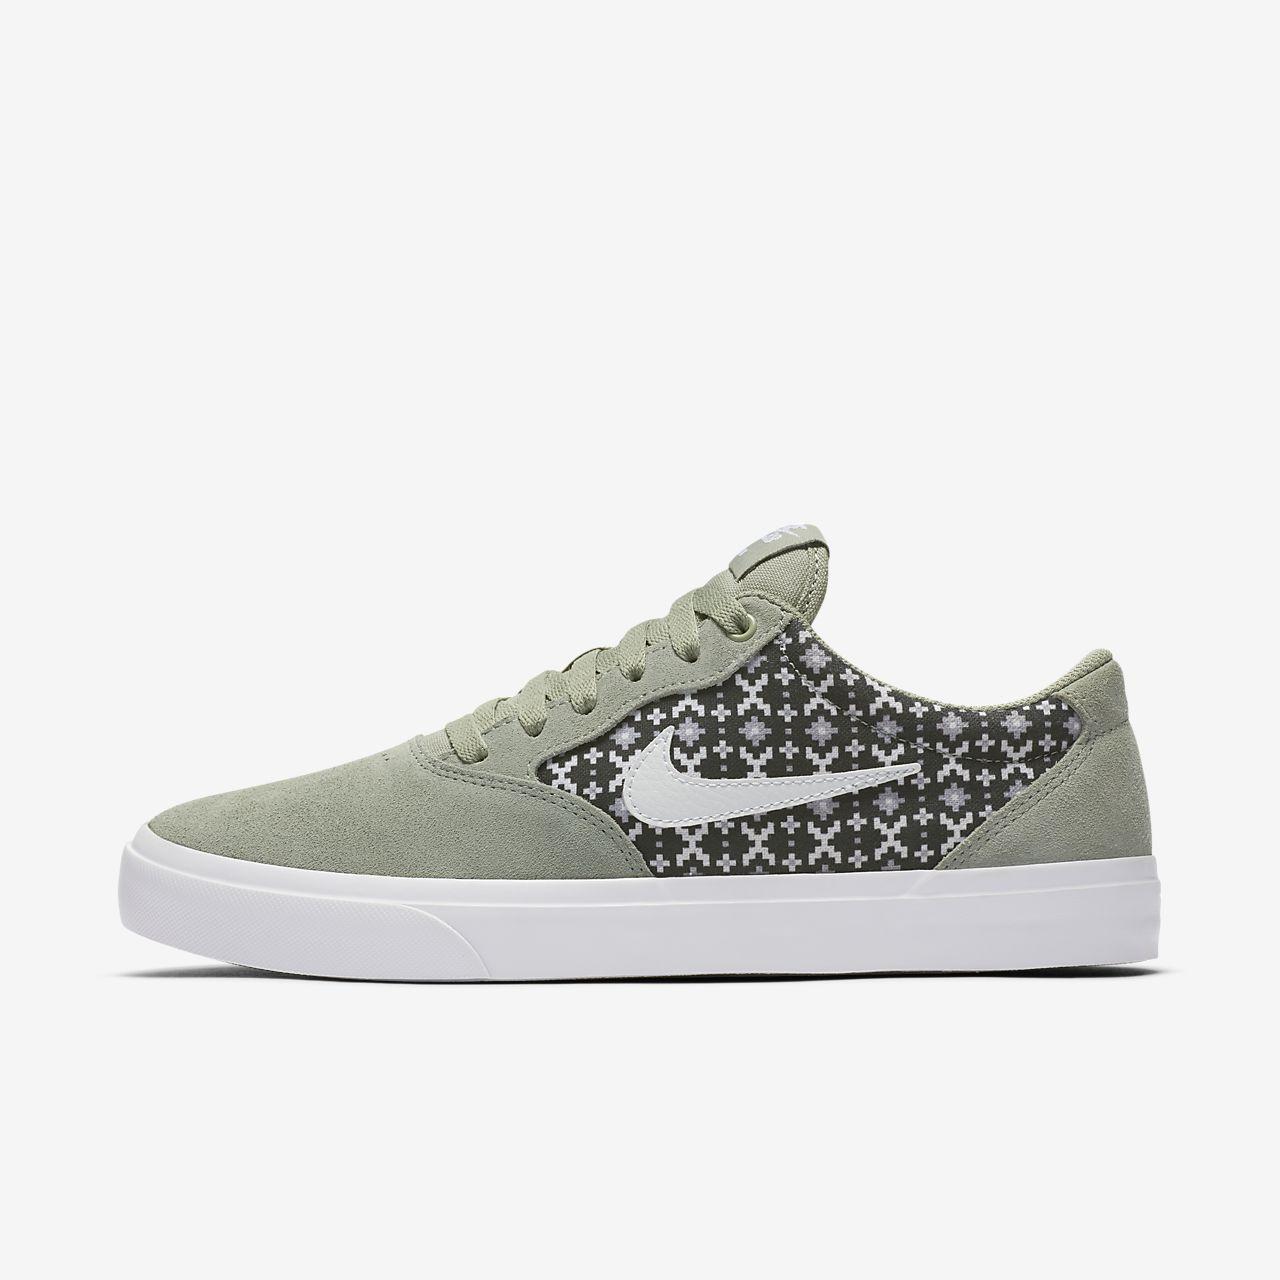 Chaussure de skateboard Nike SB Chron Solarsoft Premium